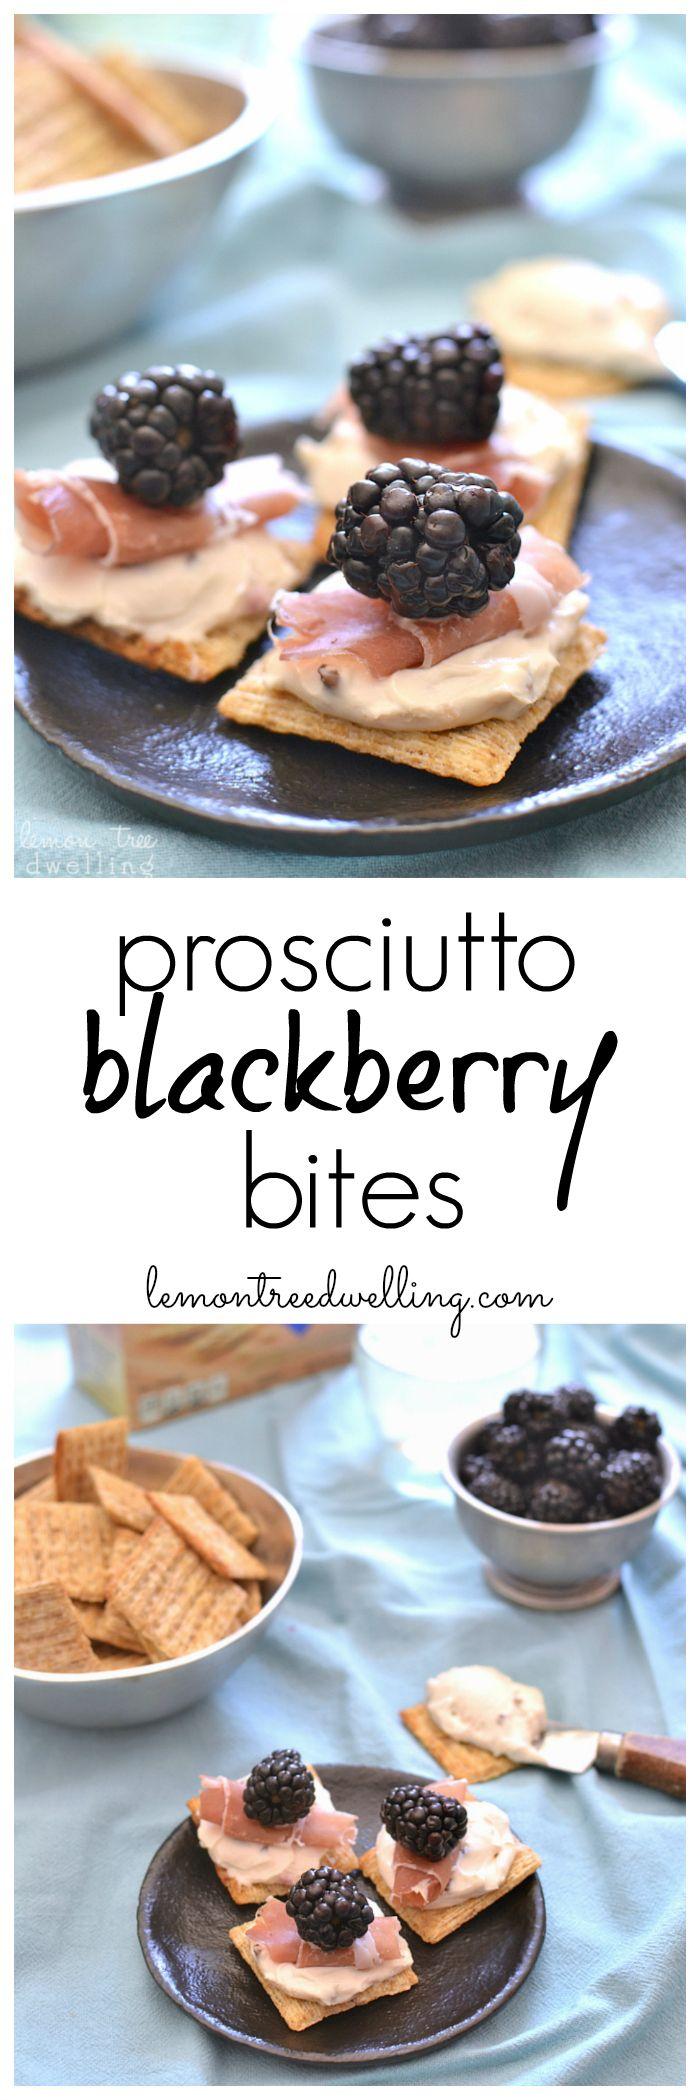 Prosciutto Blackberry Bites | Lemon Tree Dwelling